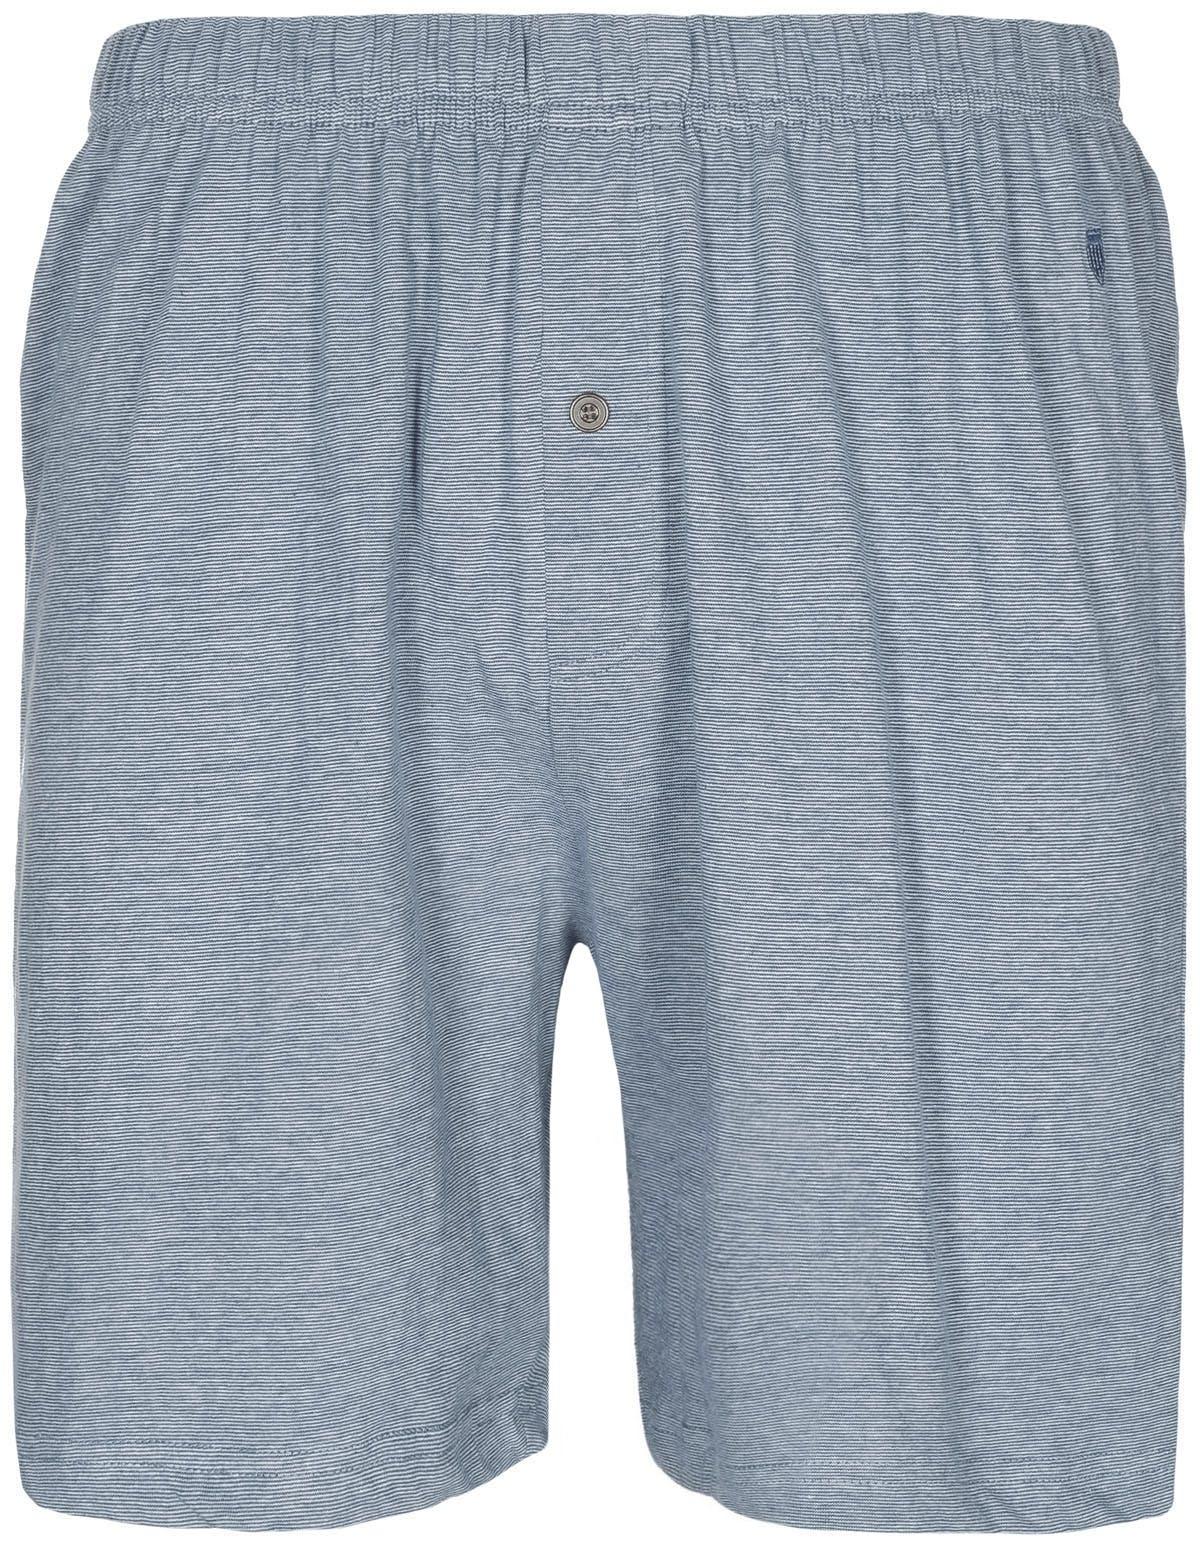 Homewear Pyjama Shorts - Denim Offwhite